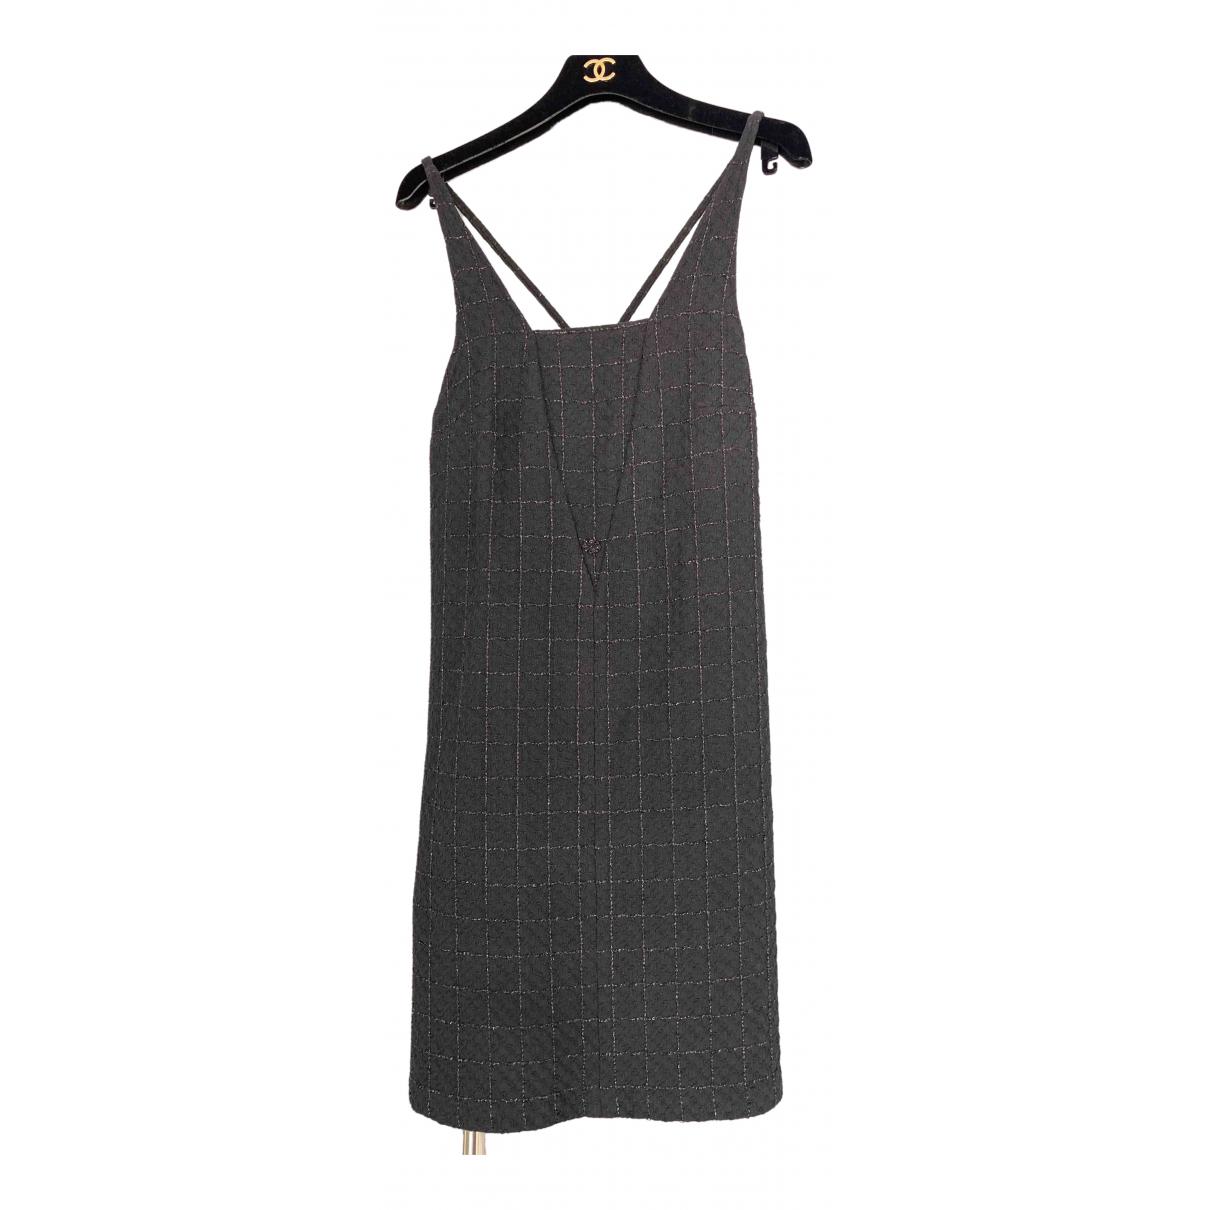 Chanel \N Black Cotton dress for Women 36 FR